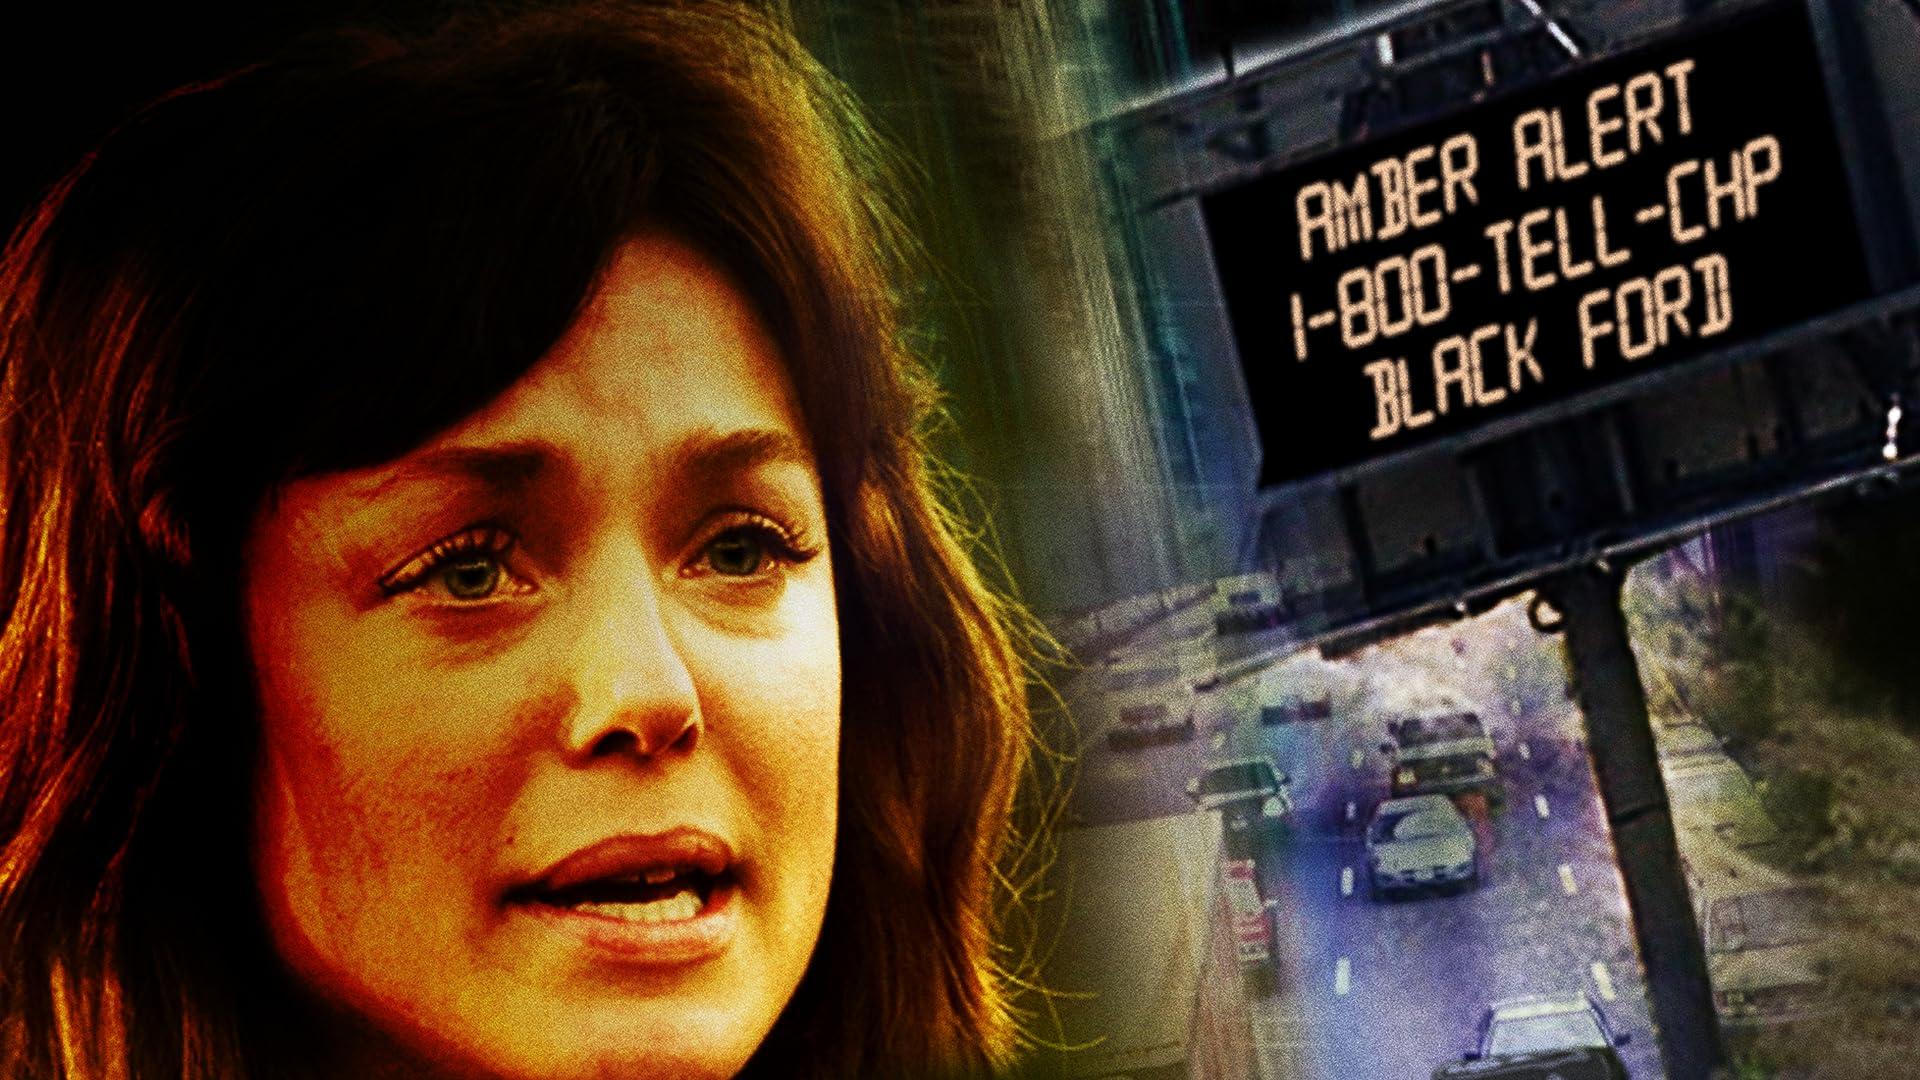 Amber Alert (aka Amber's Story)